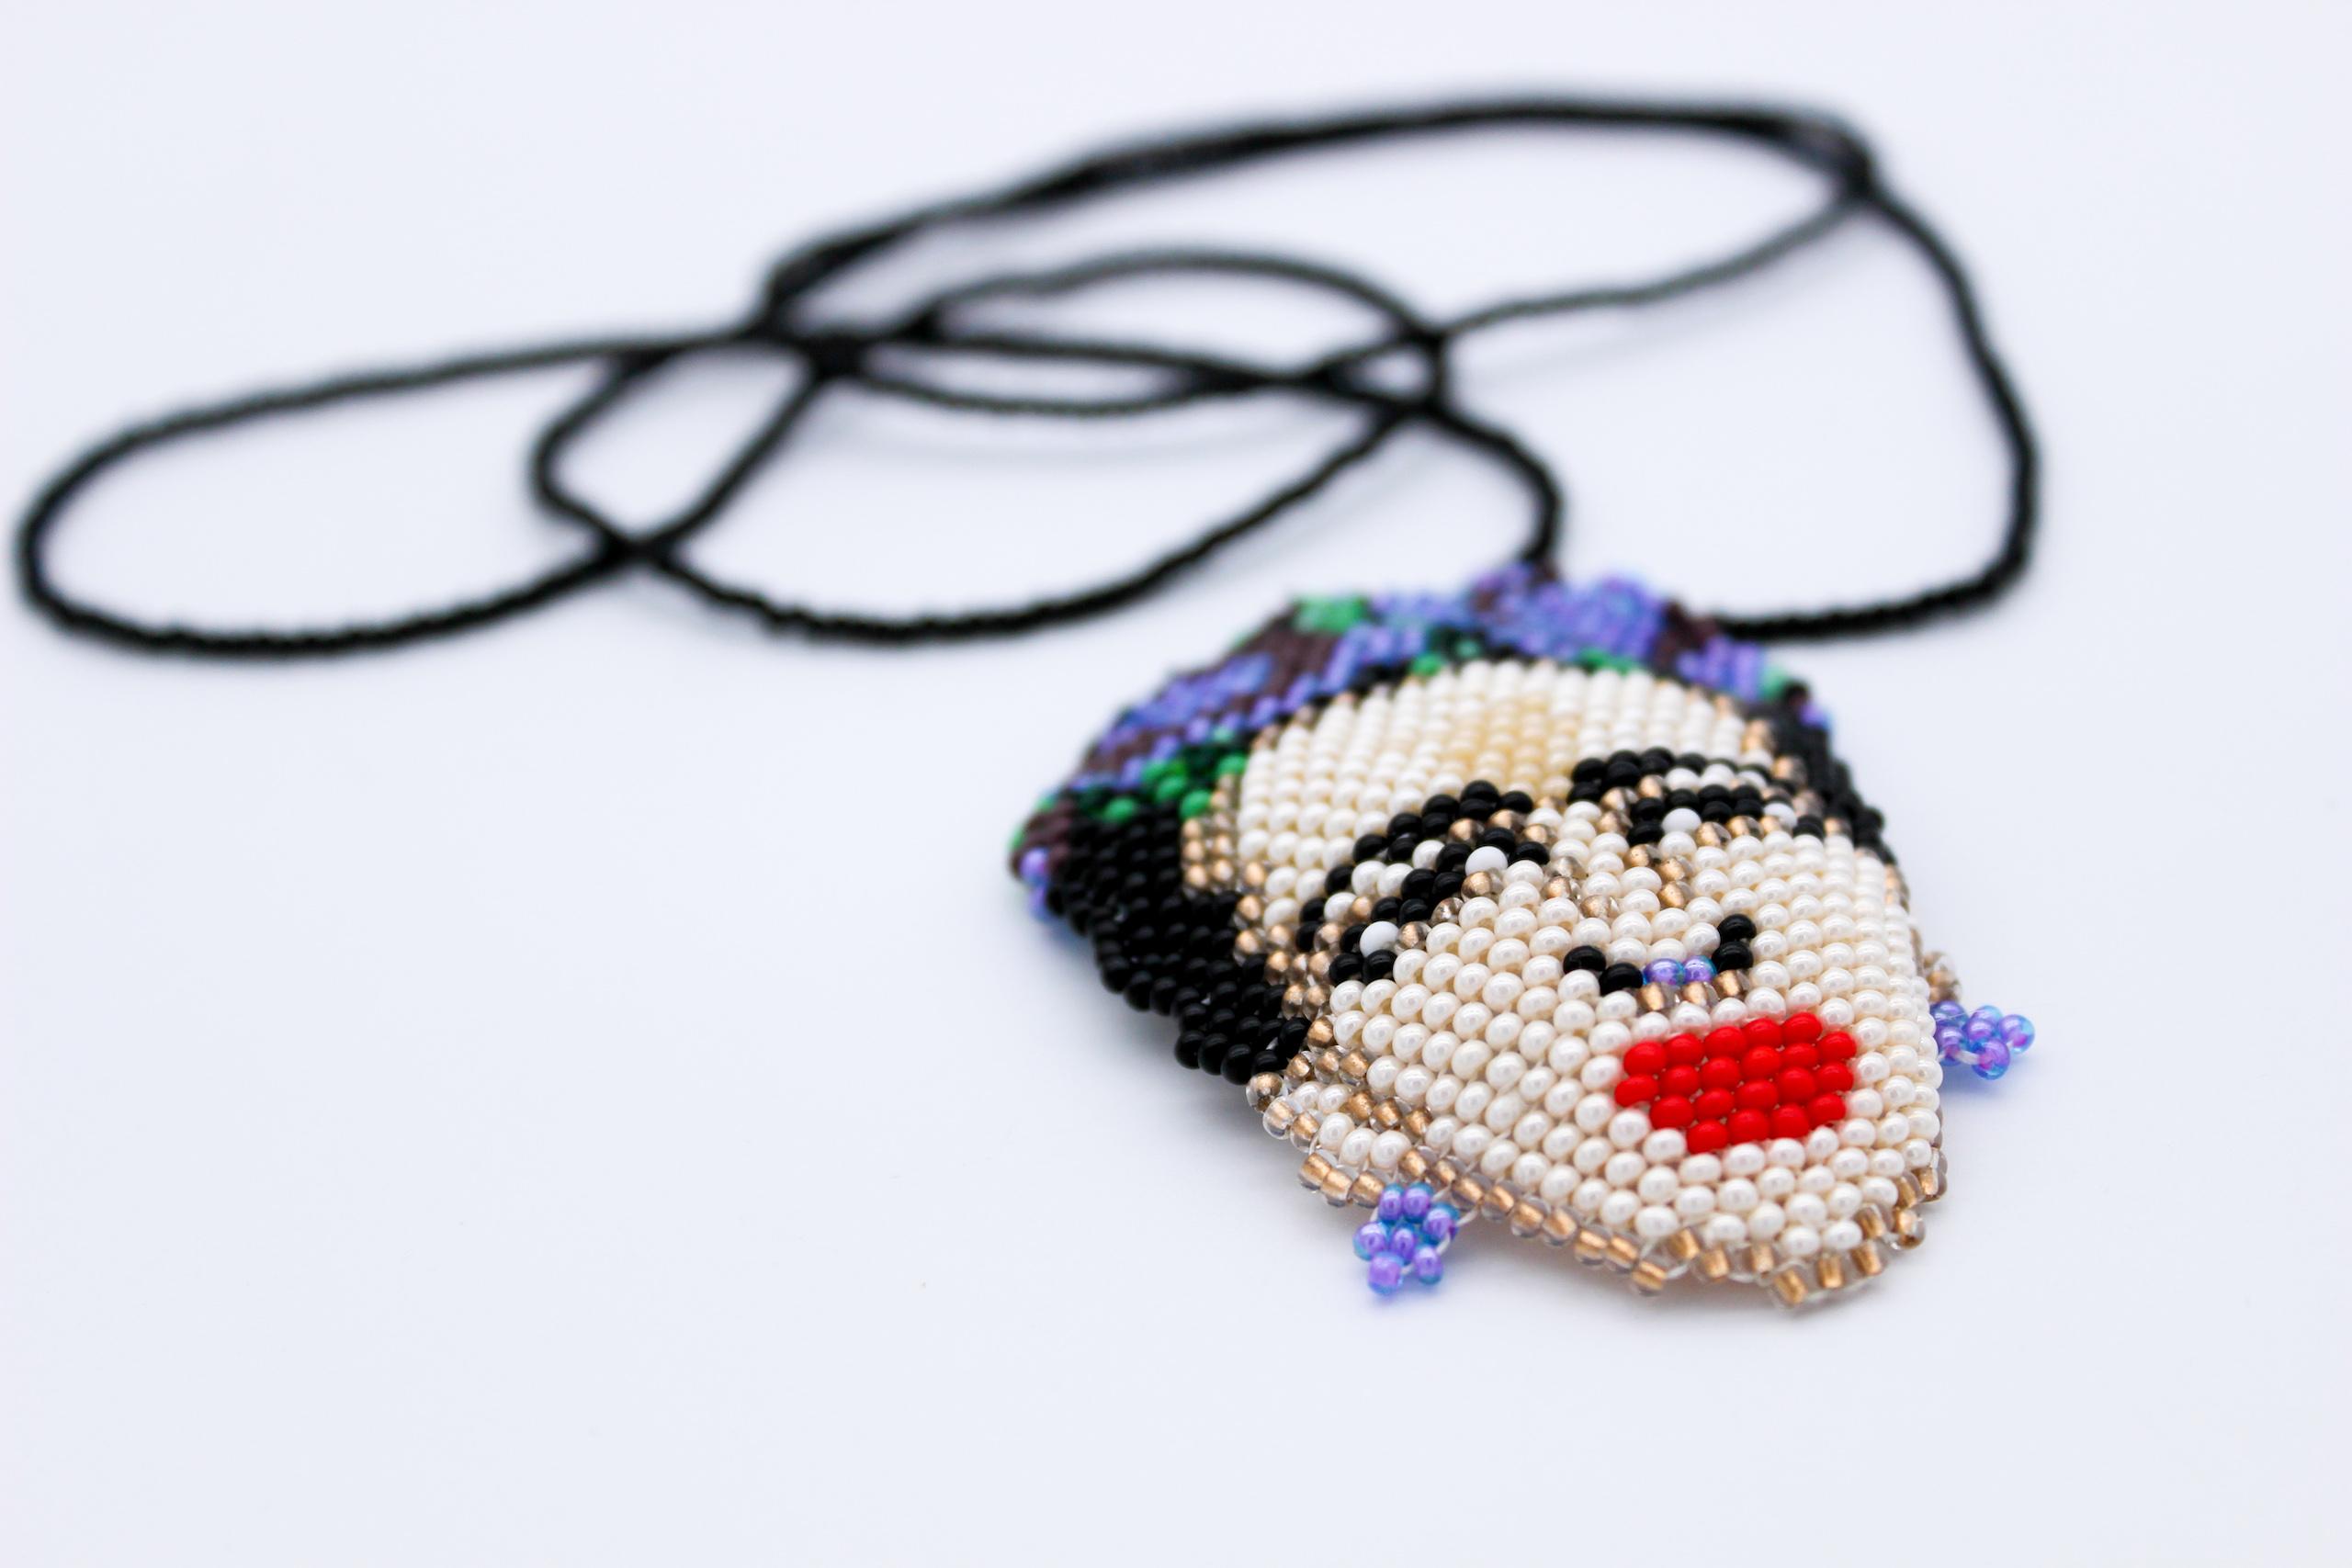 frieda-beaded-necklace-close-up